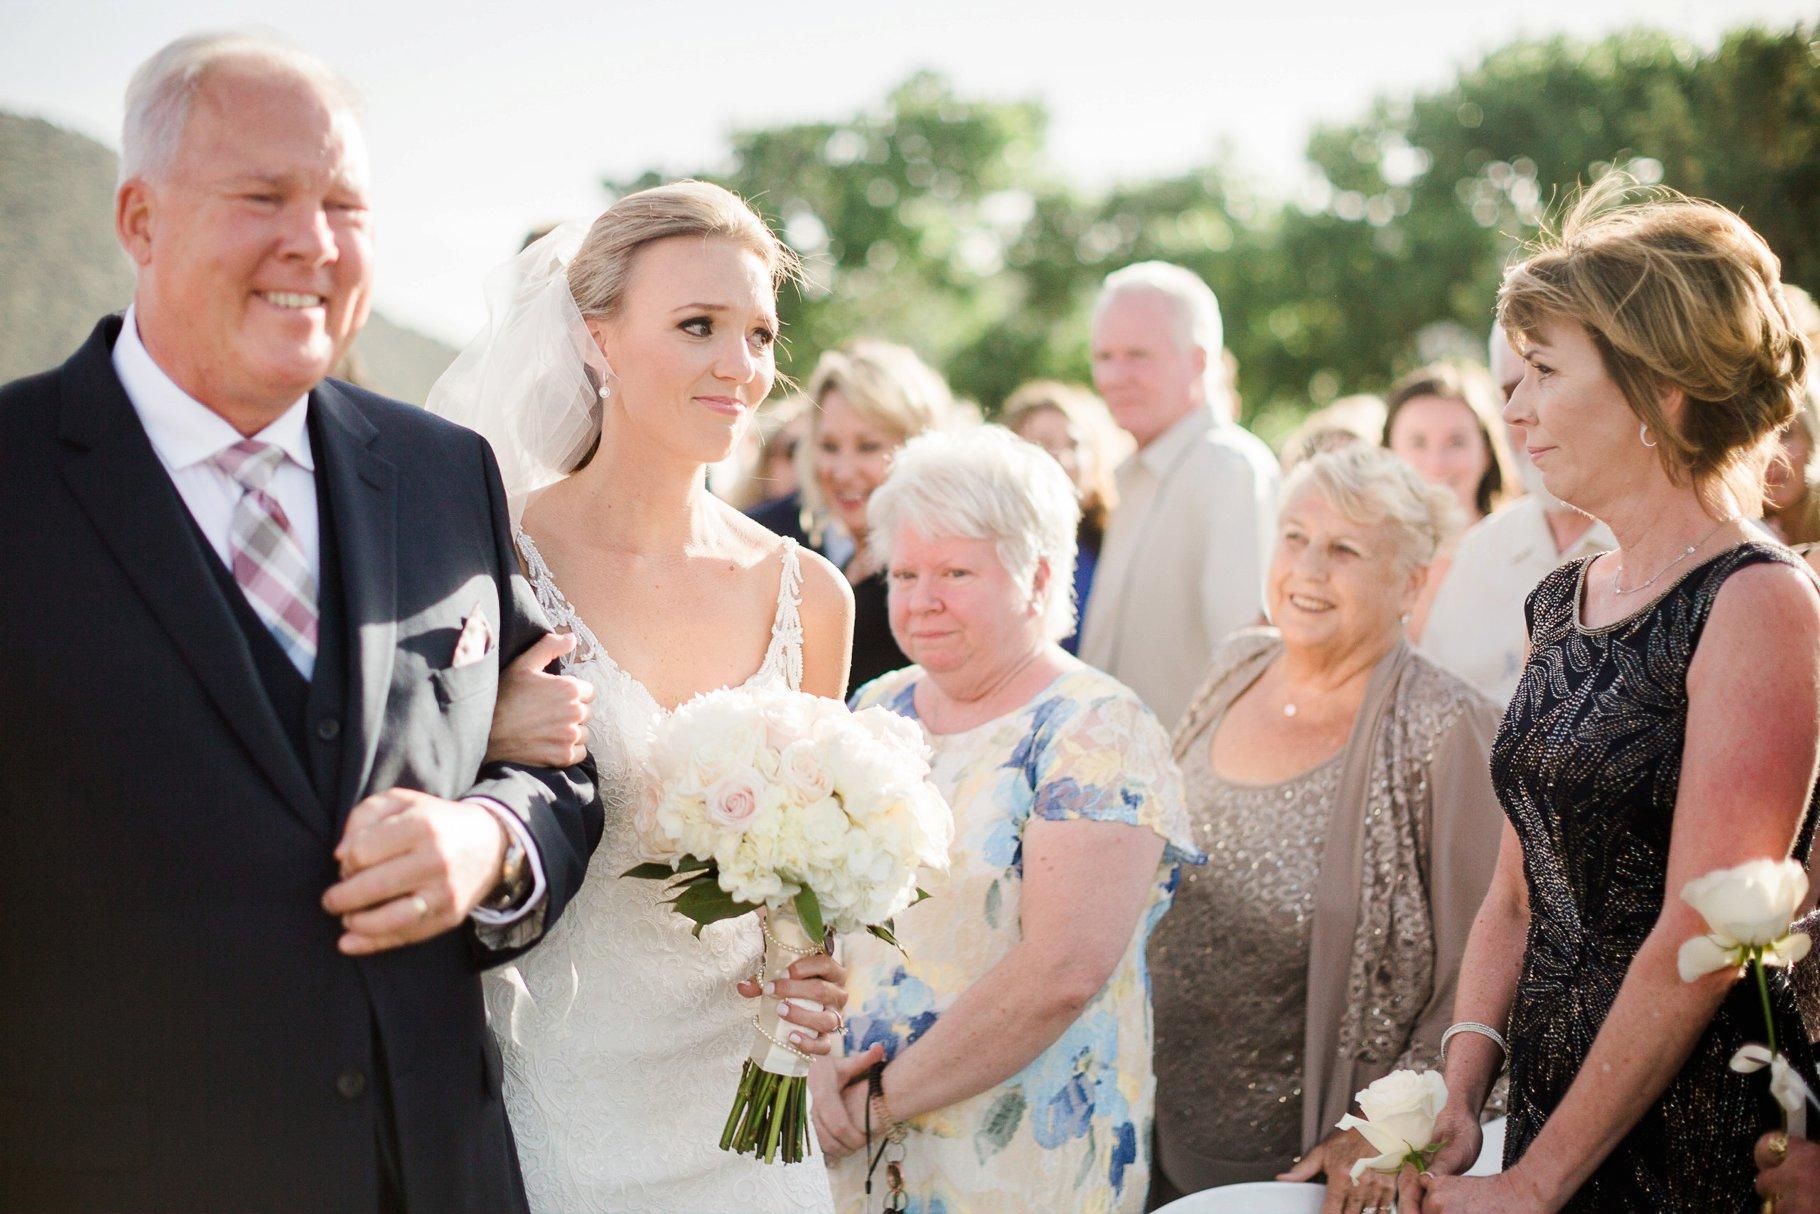 sedona wedding-68_GRETCHEN WAKEMAN PHOTOGRAPHY.jpg